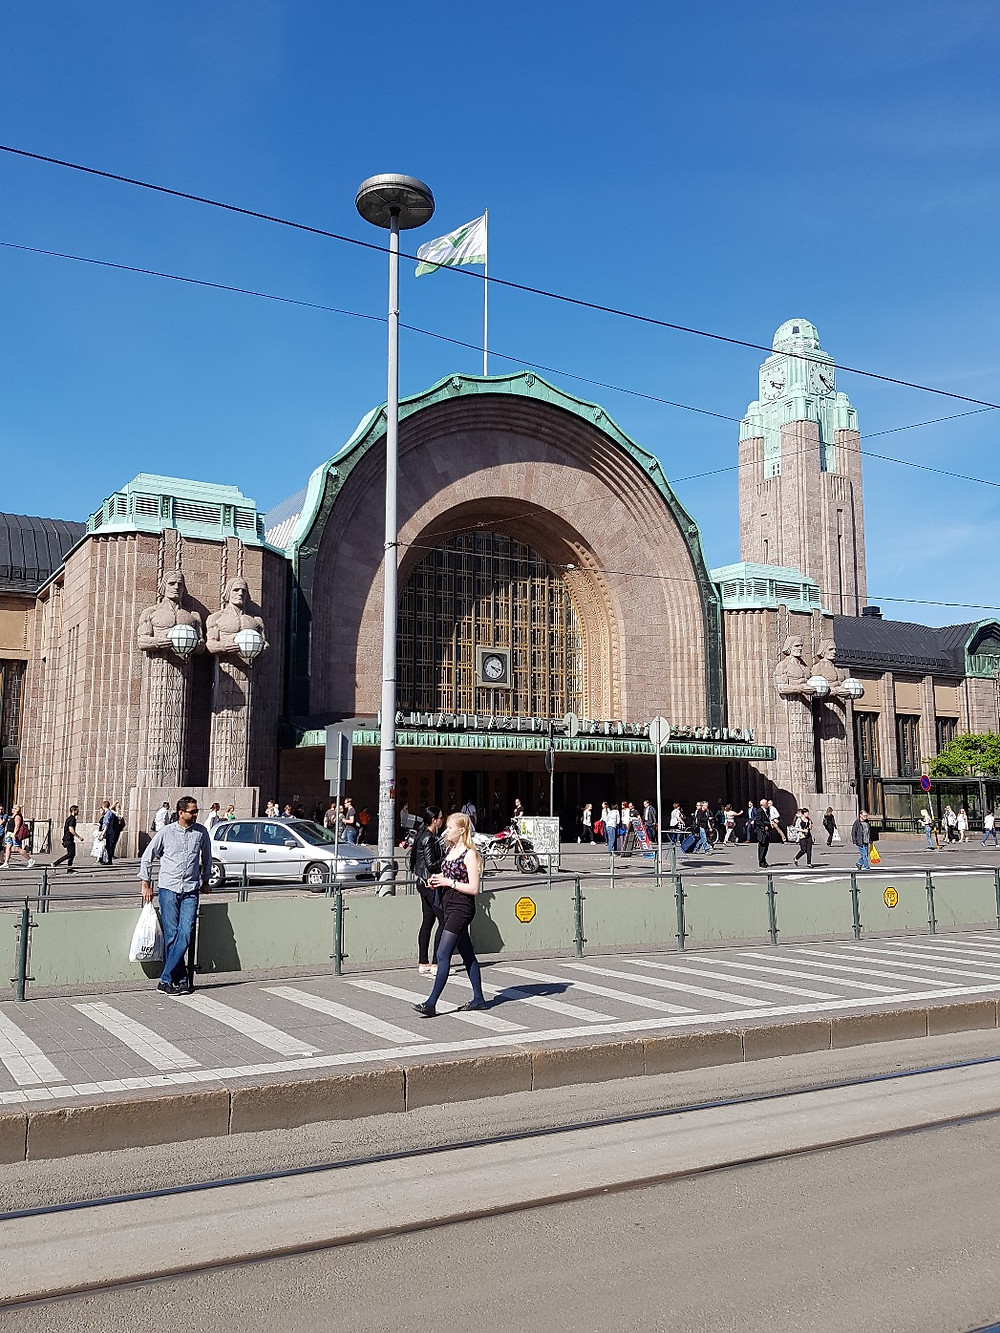 Helsinki Central Station, Finland